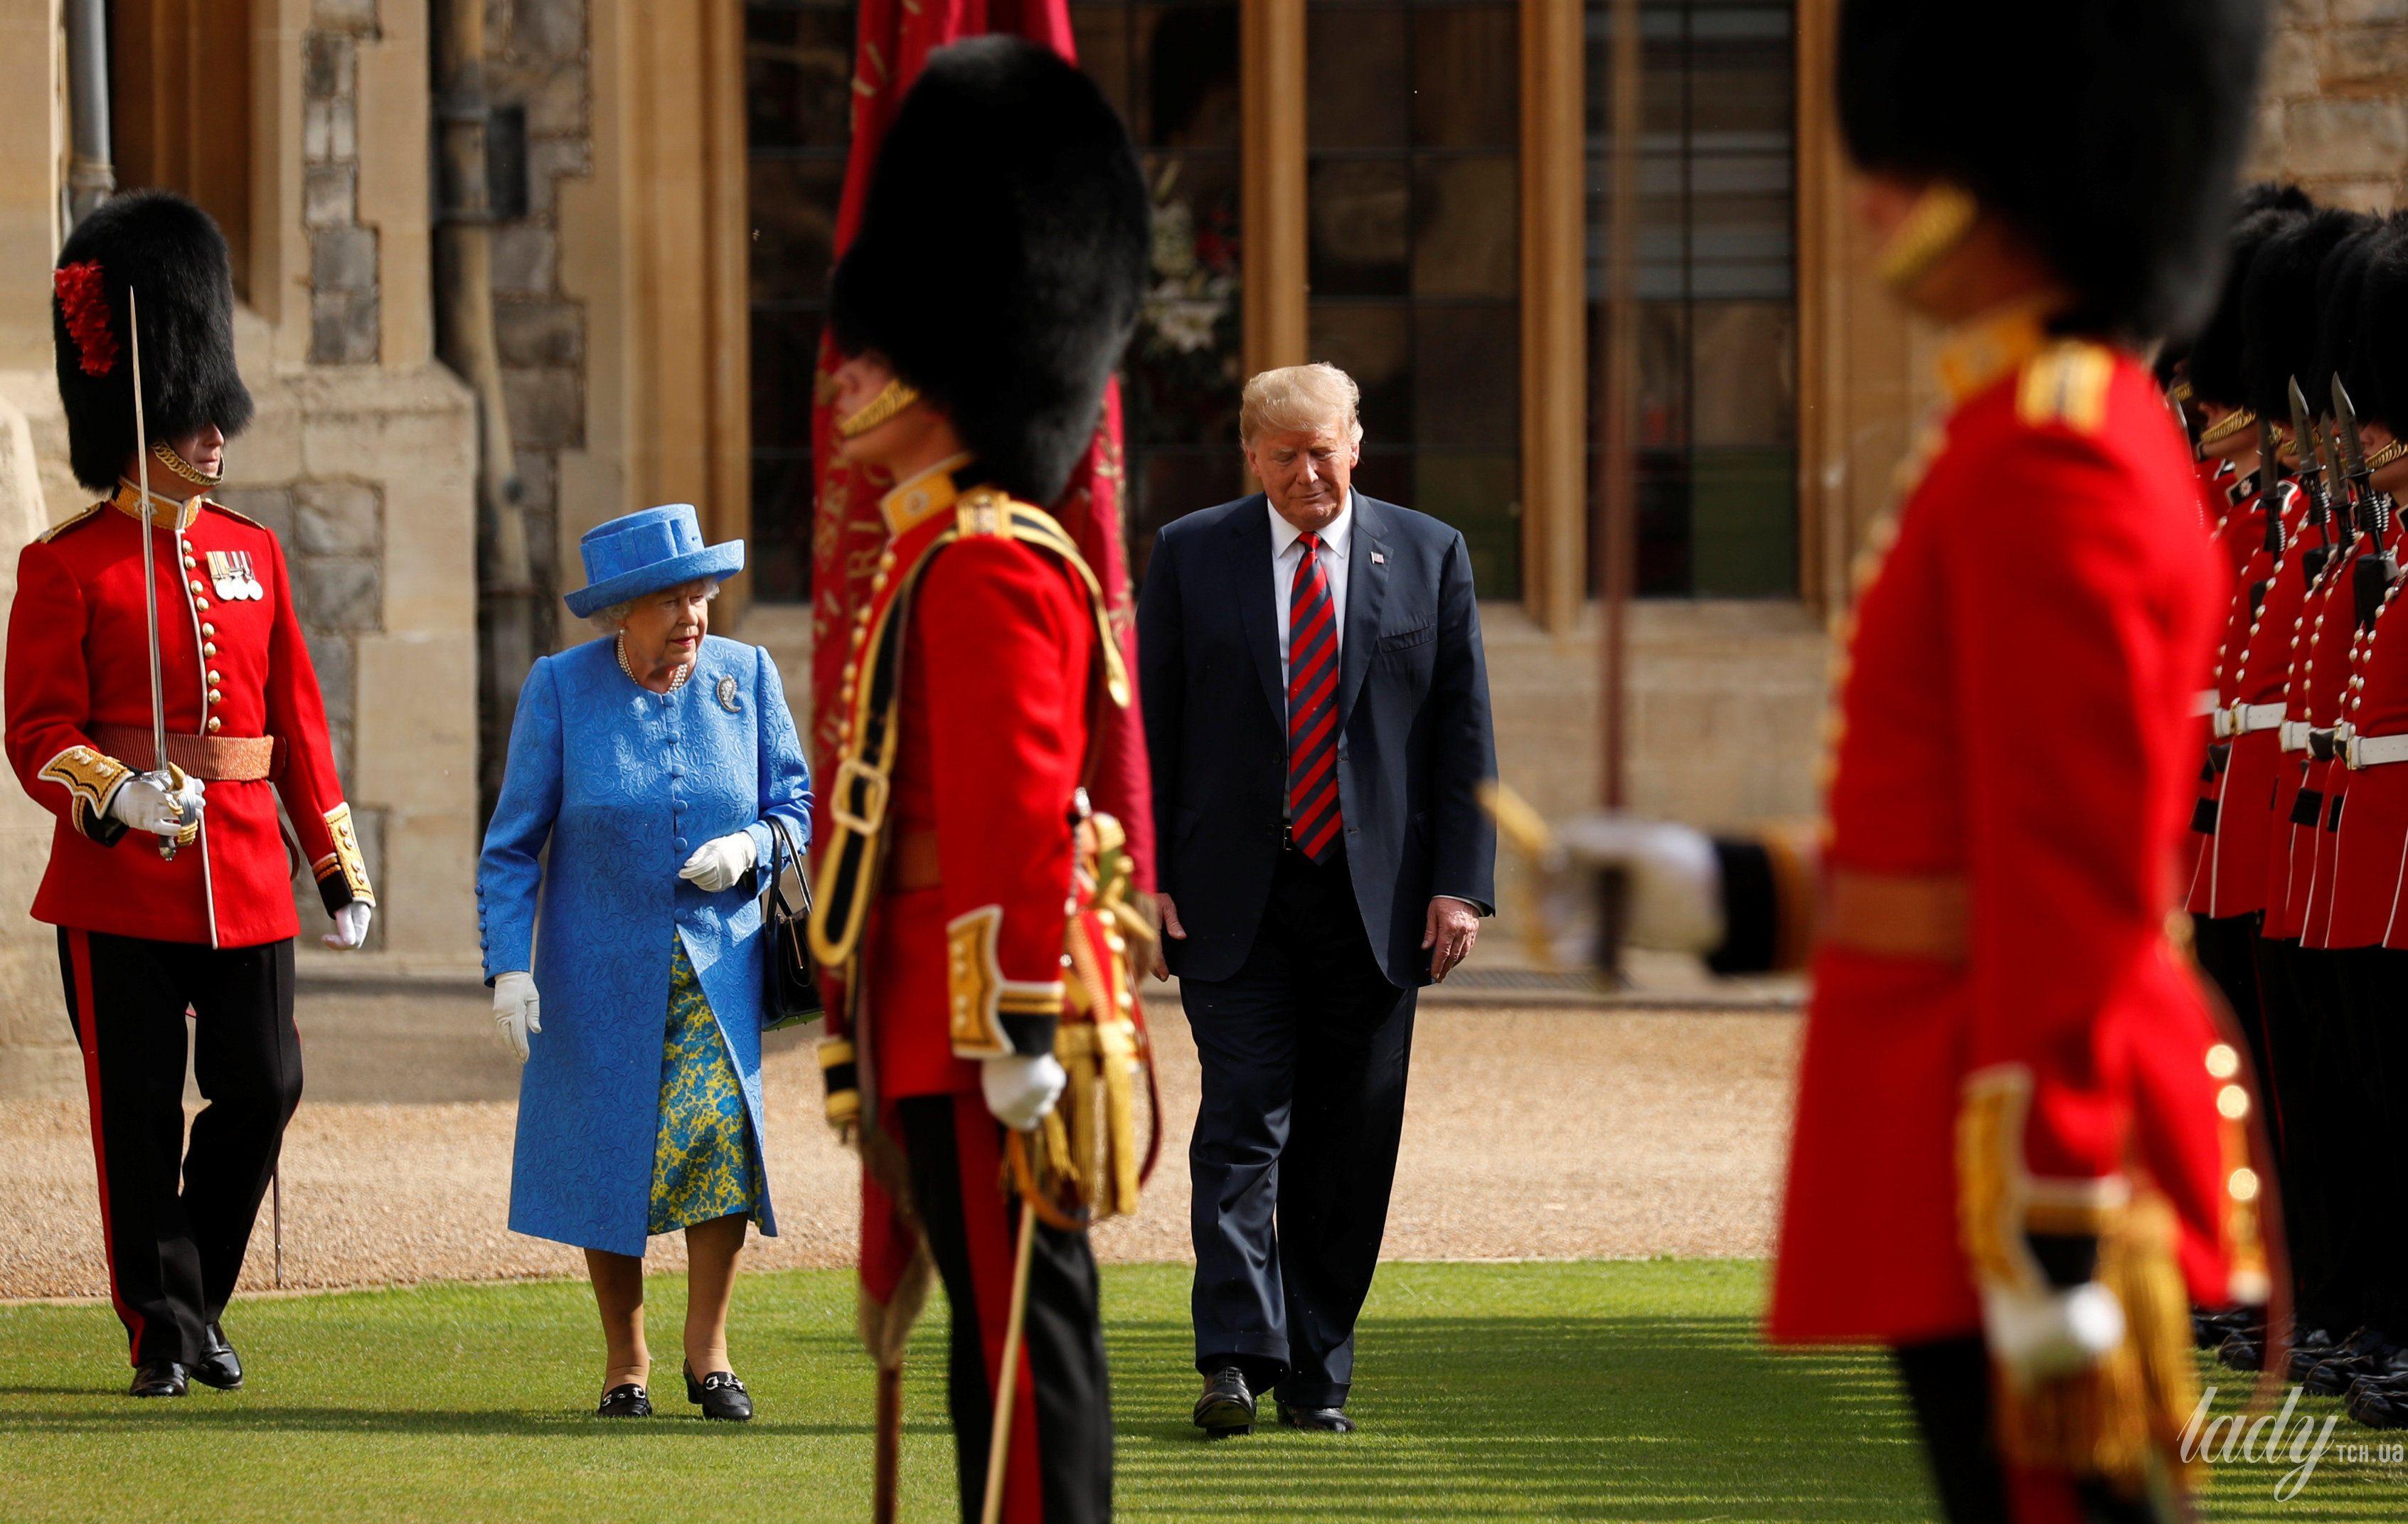 Королева Елизавета II, Мелания Трамп и Дональд Трамп_7